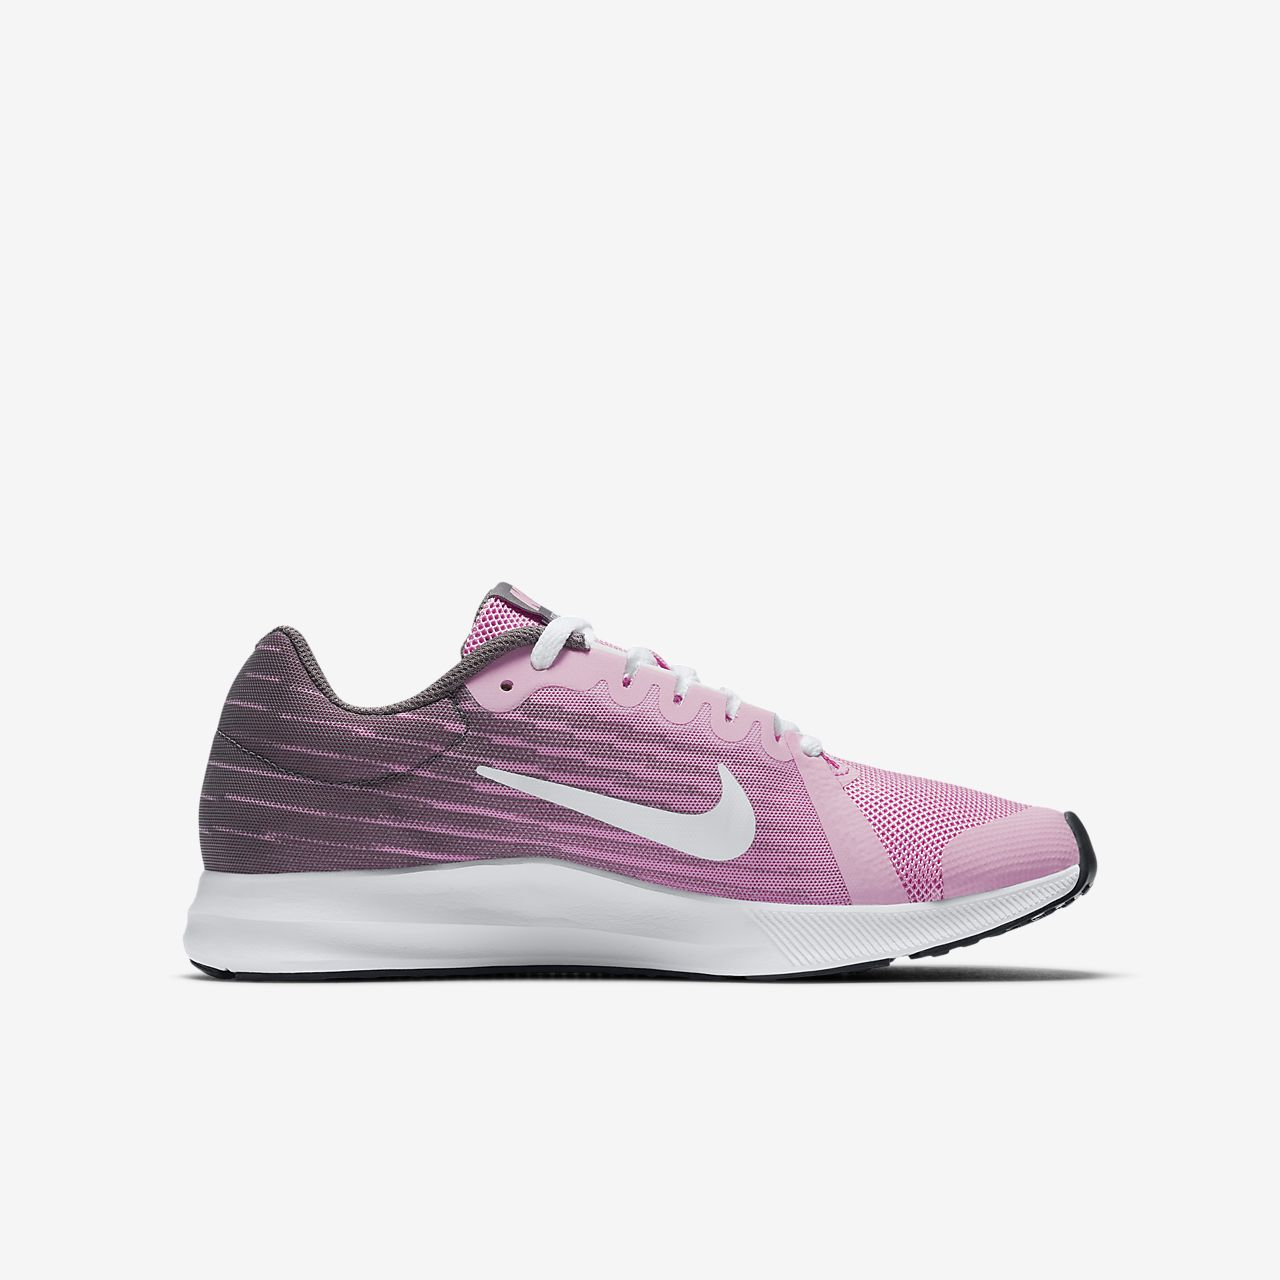 87efb9332c804 Nike Downshifter 8 Older Kids  Running Shoe. Nike.com GB